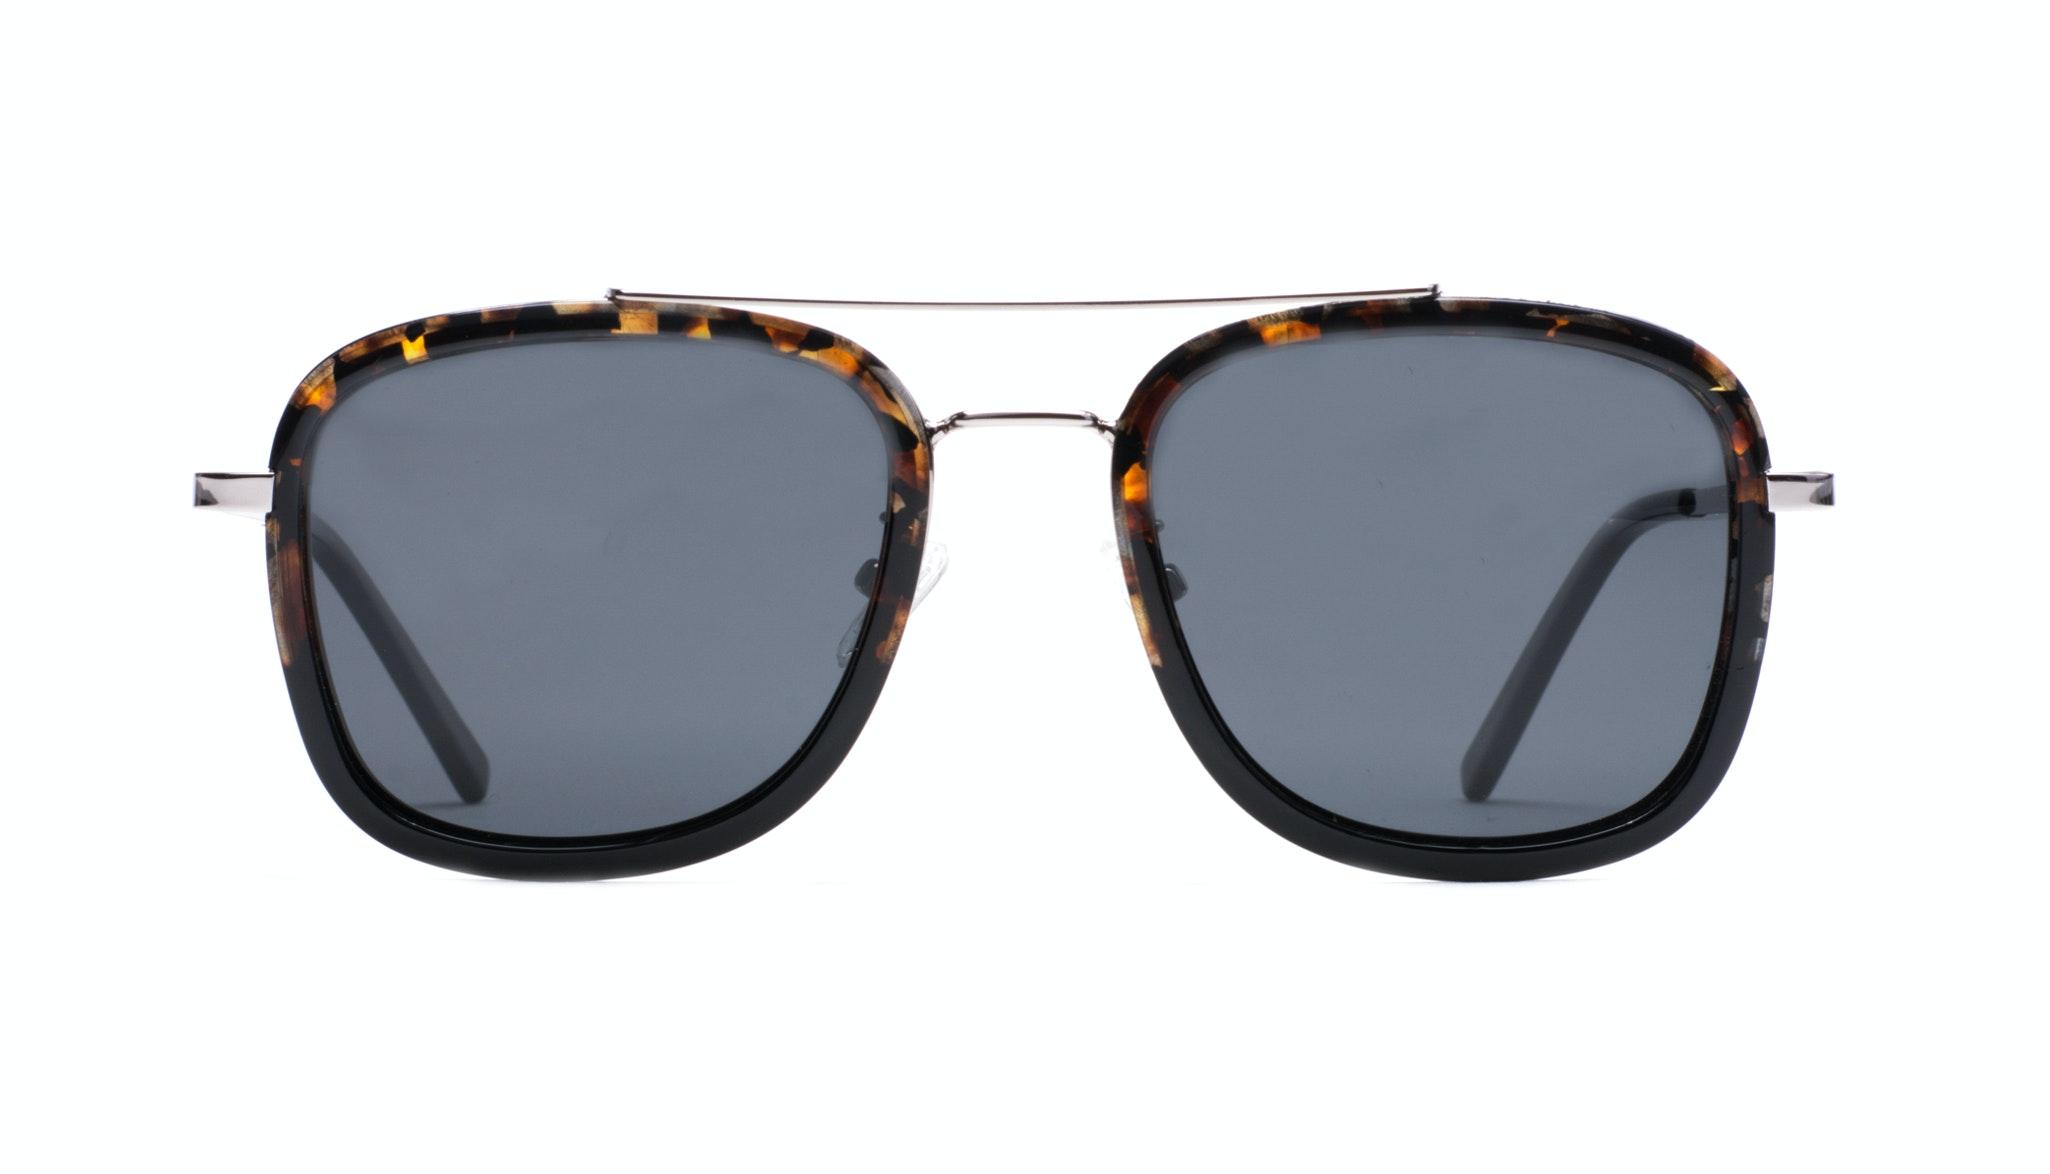 Affordable Fashion Glasses Aviator Rectangle Sunglasses Men Class Mahogany Black